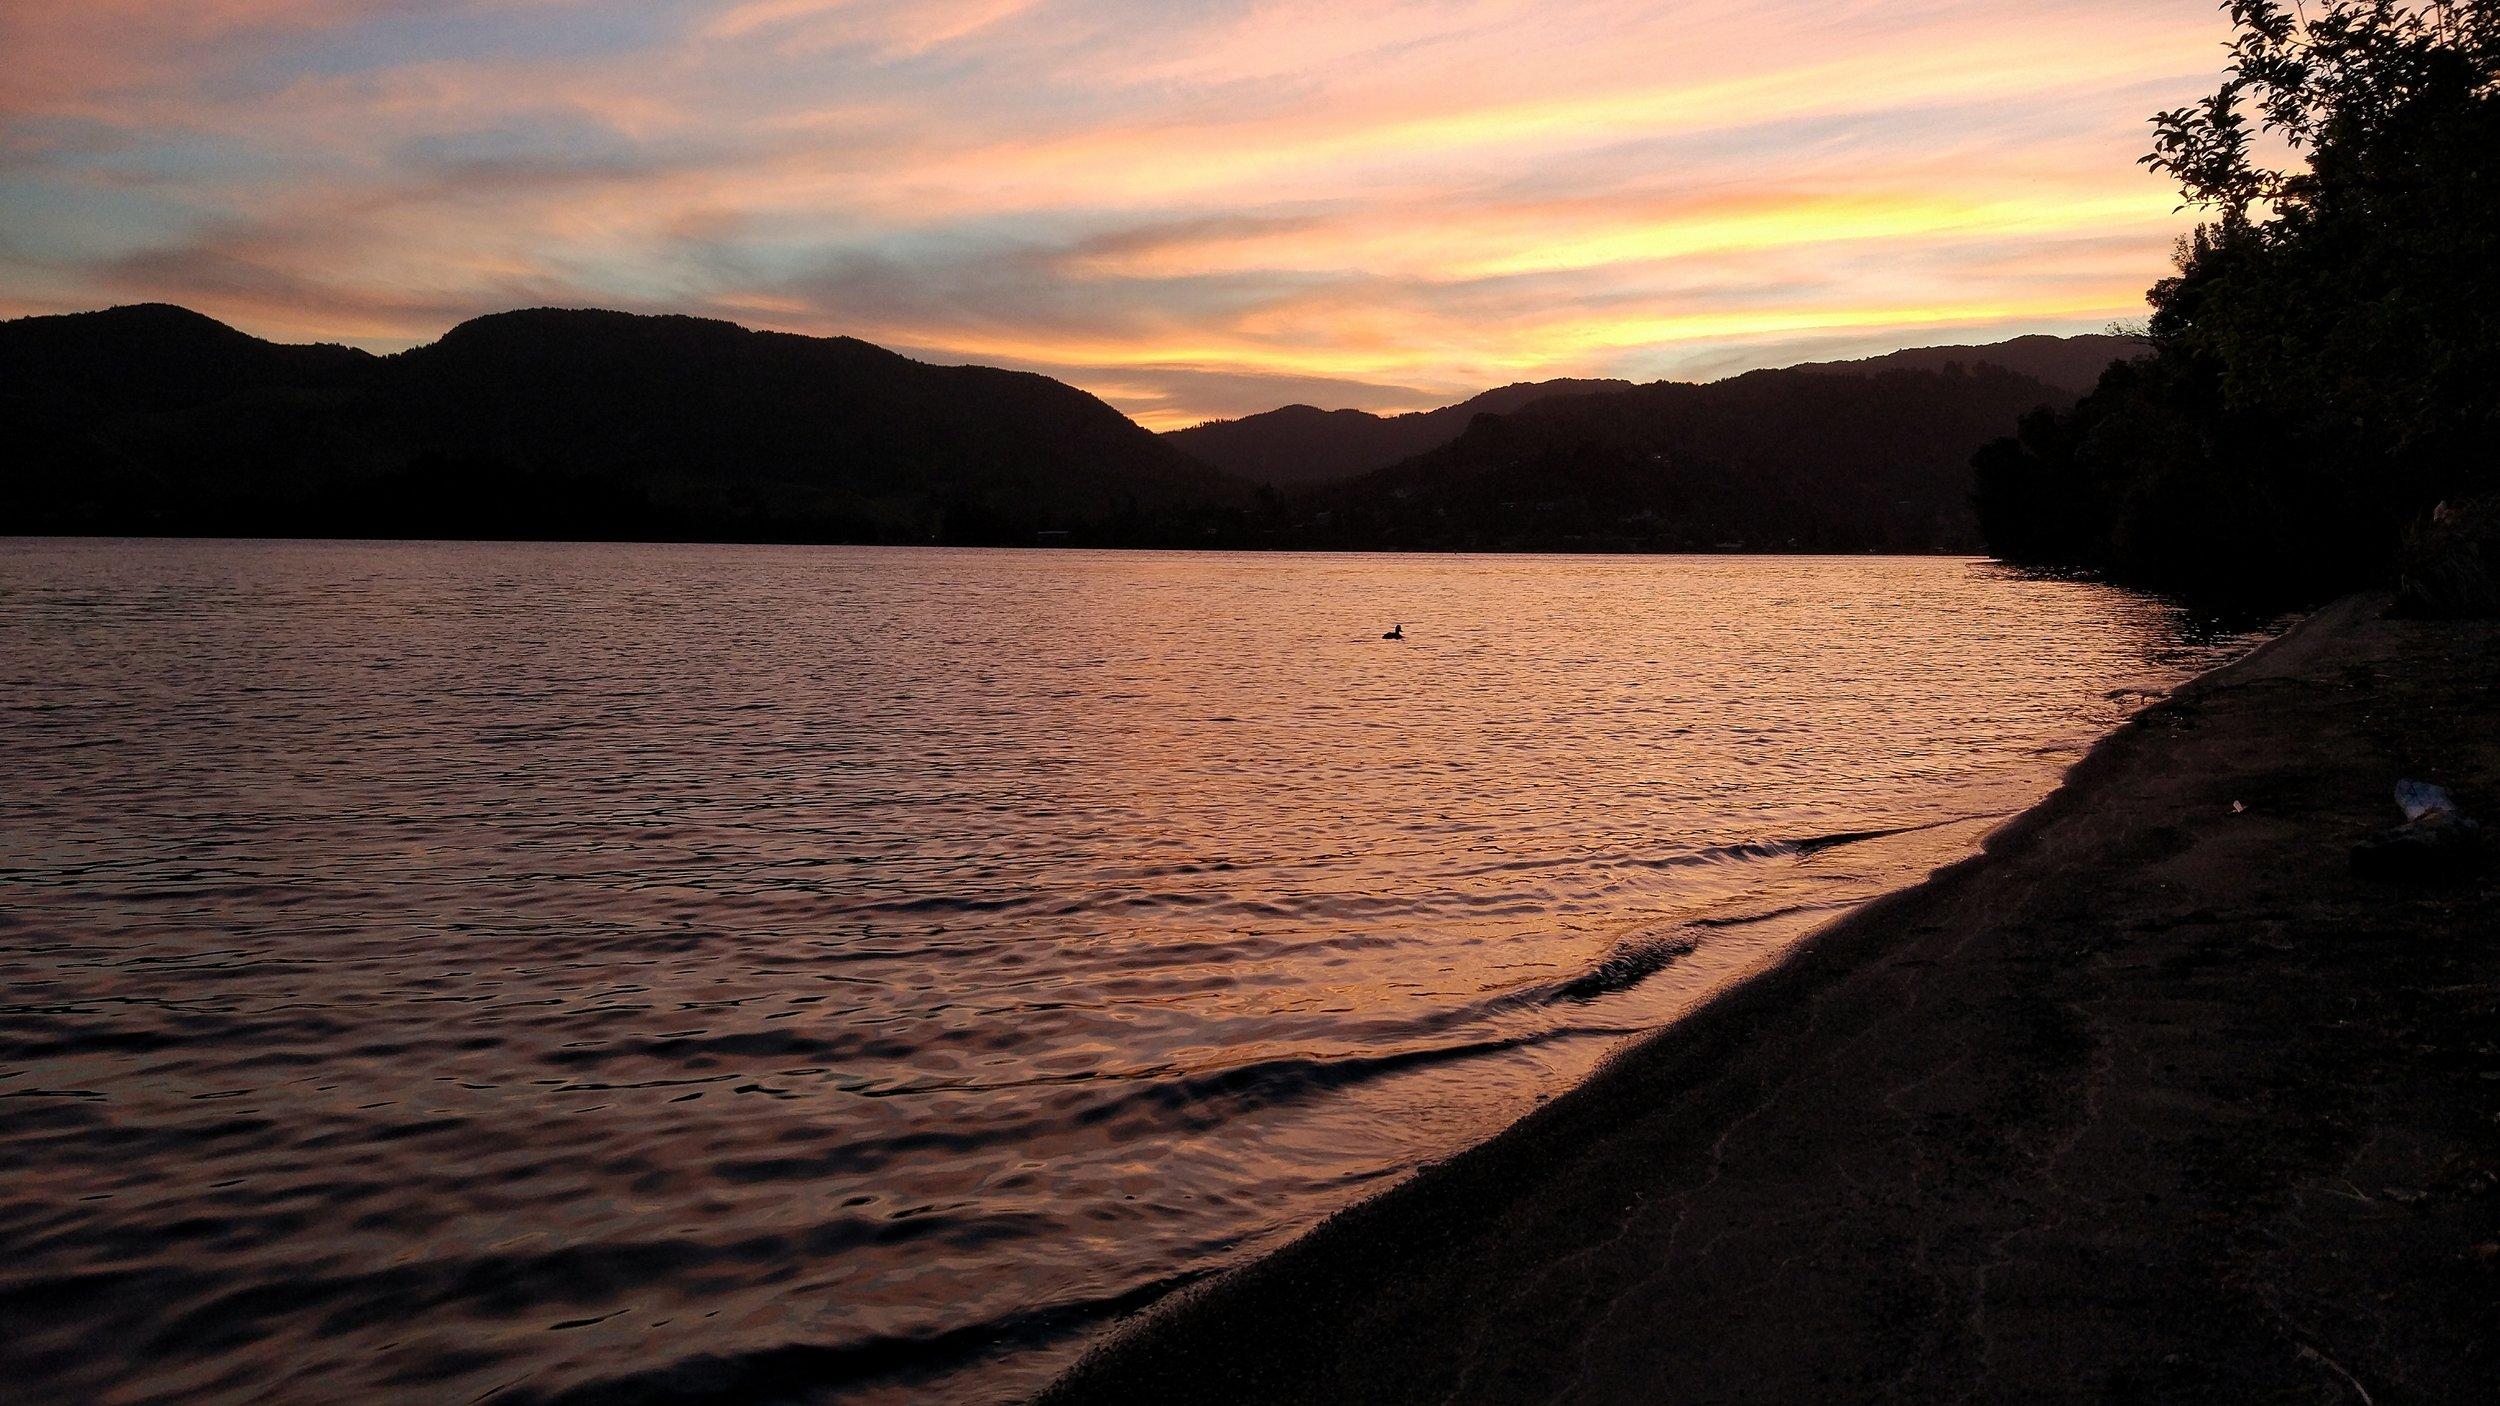 sunset for dinner, lake okareka campsite, rotorua, New Zealand